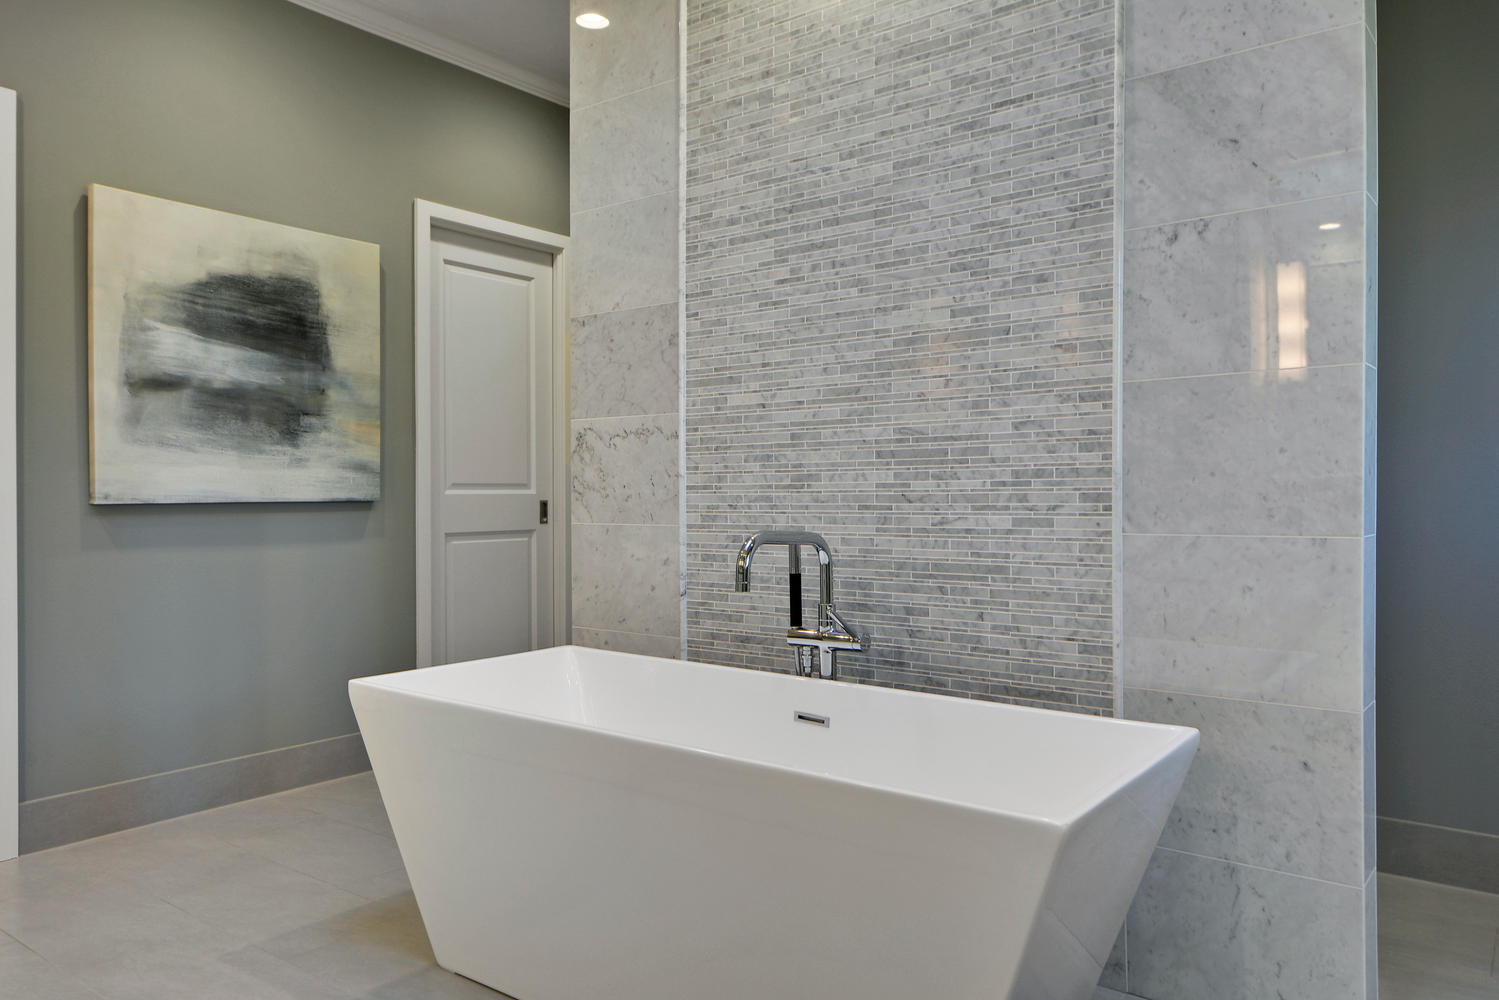 Soaking tub in Austin bathroom remodel